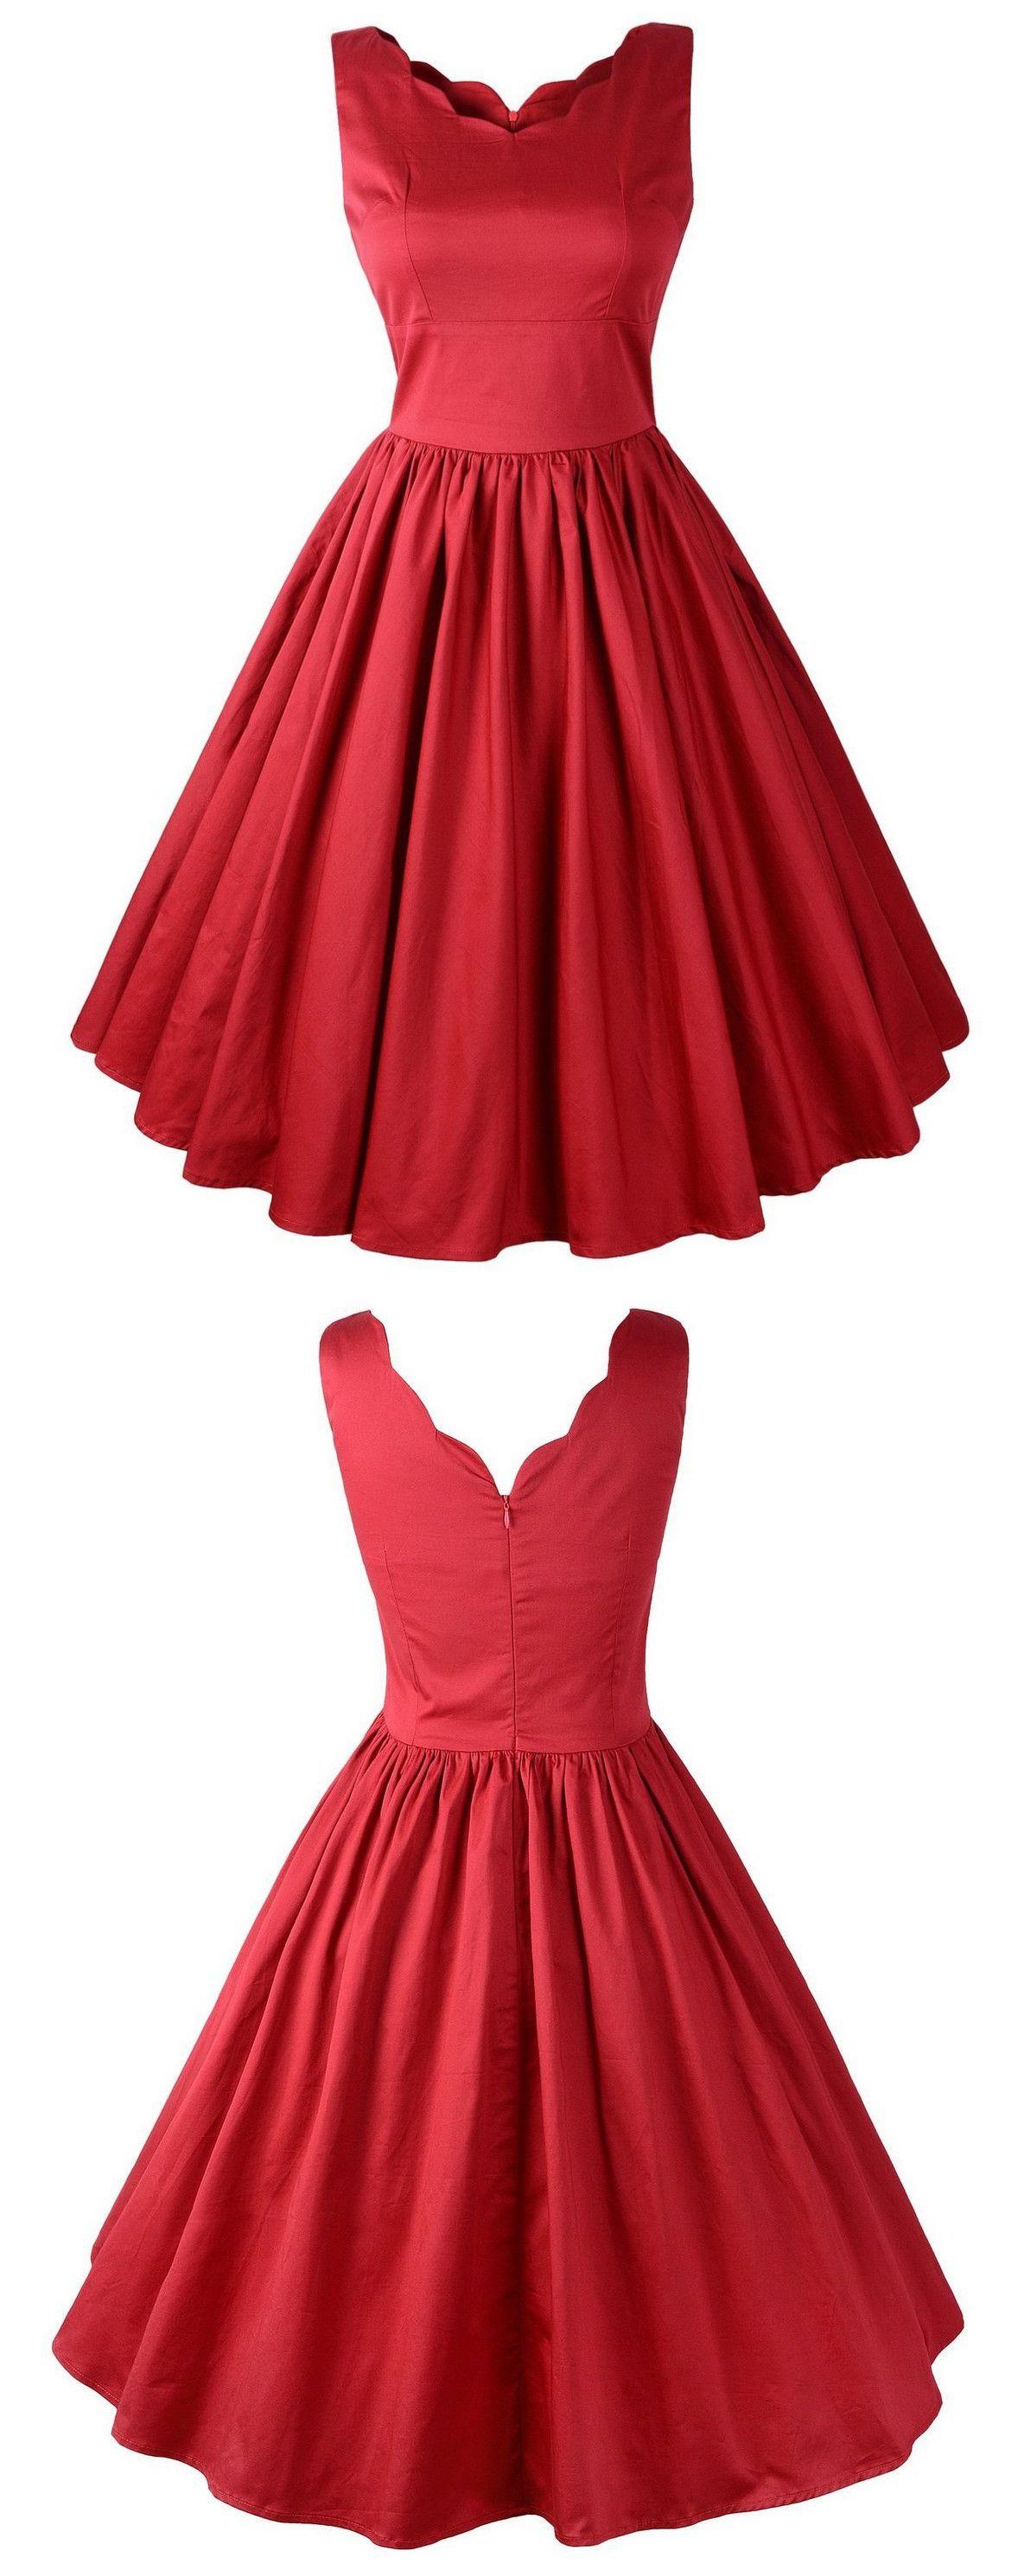 Simple aline short red dress in evening dresses pinterest